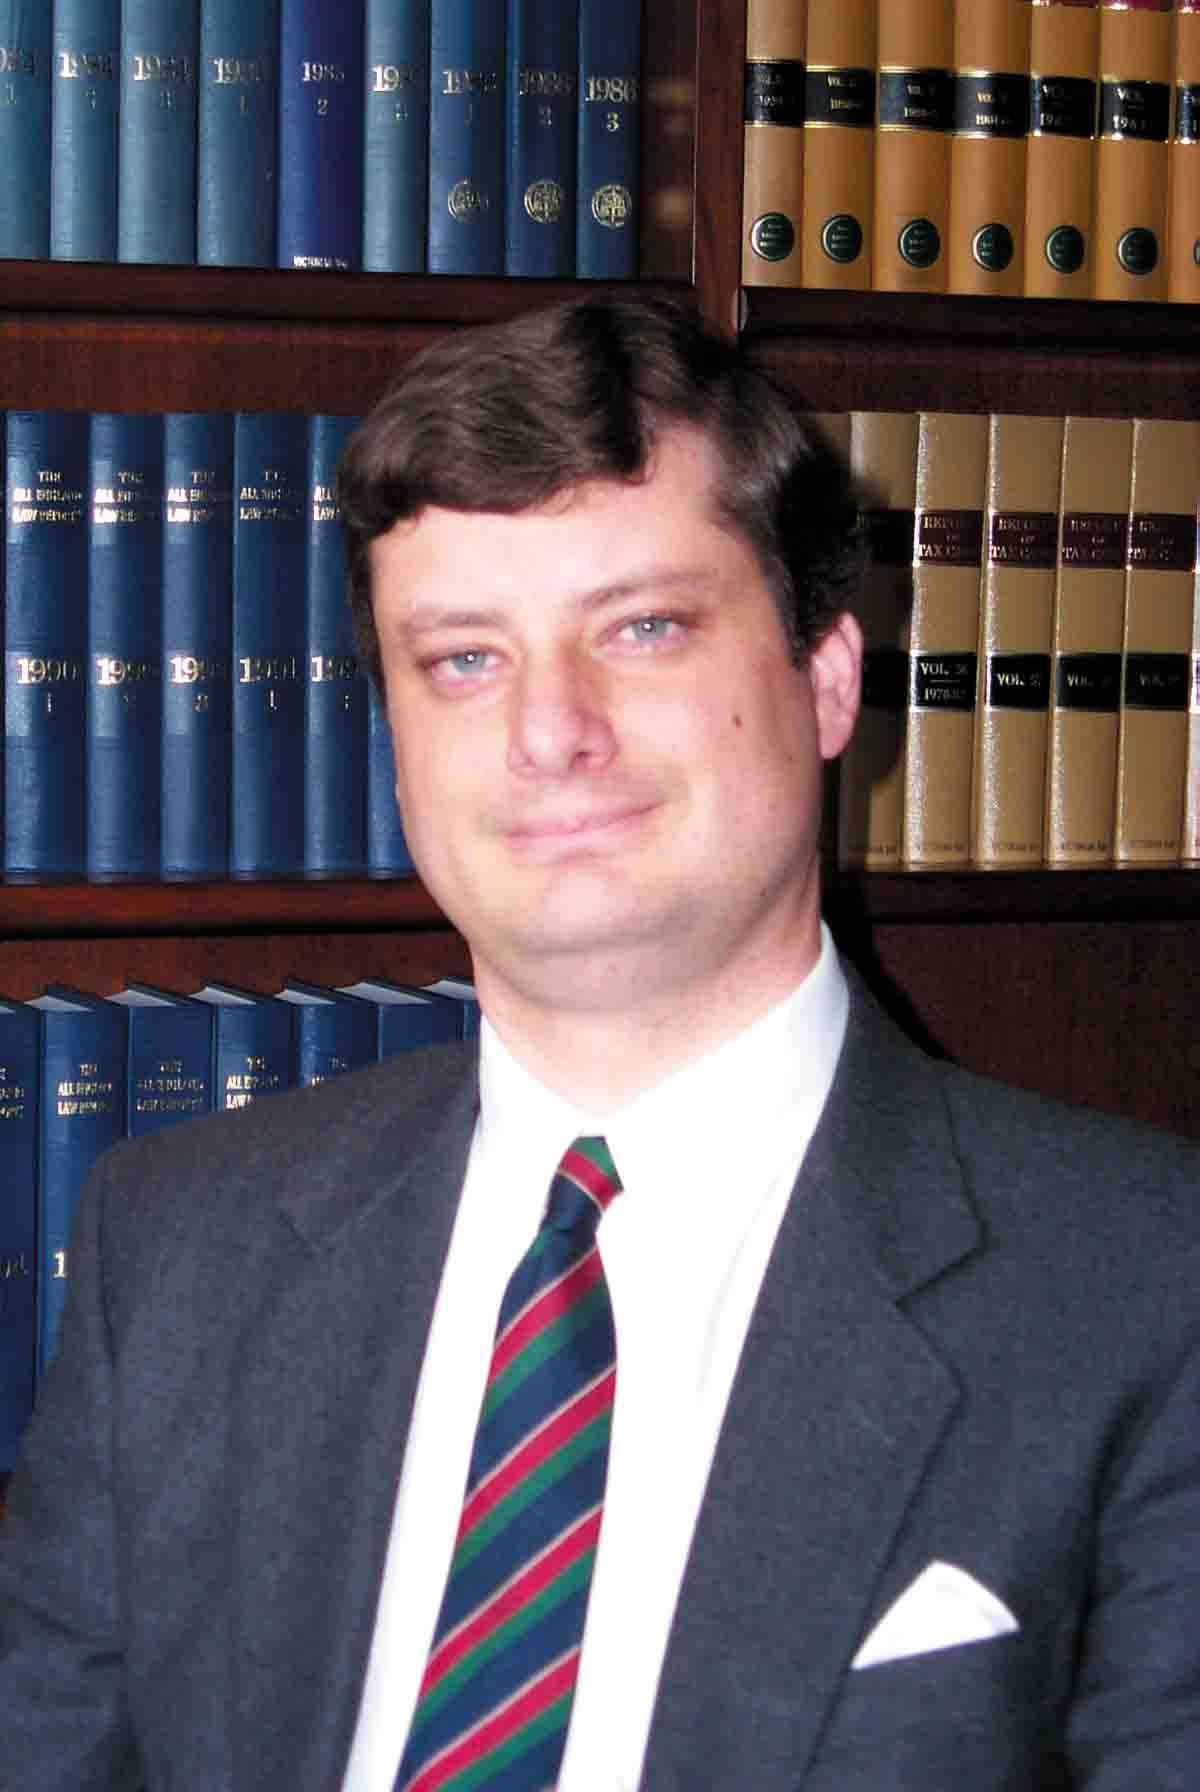 Michael King, B.A., LL.B